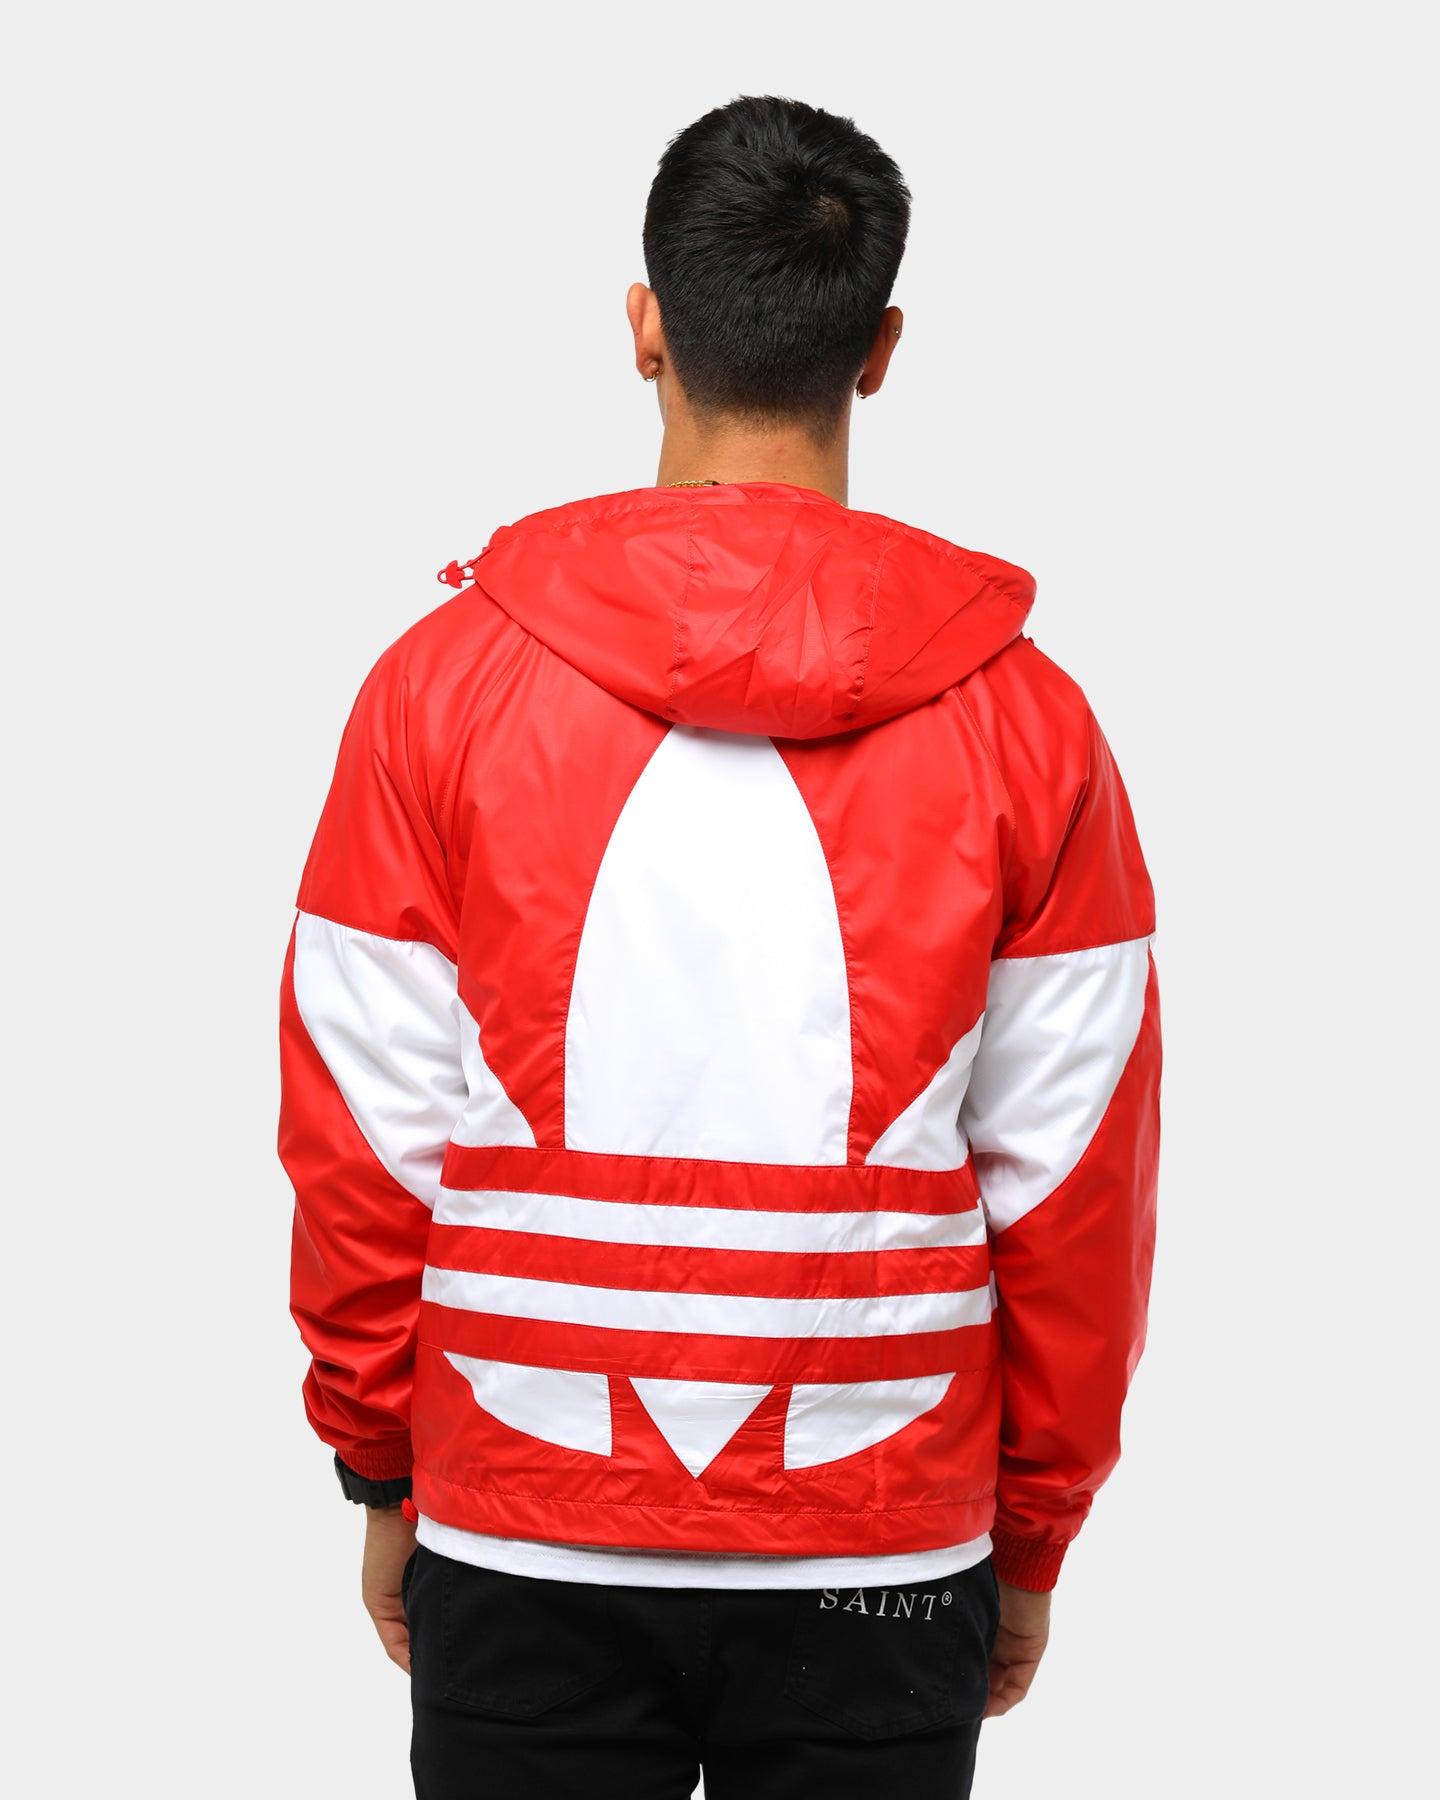 Adidas Big Trefoil Windbreaker Red